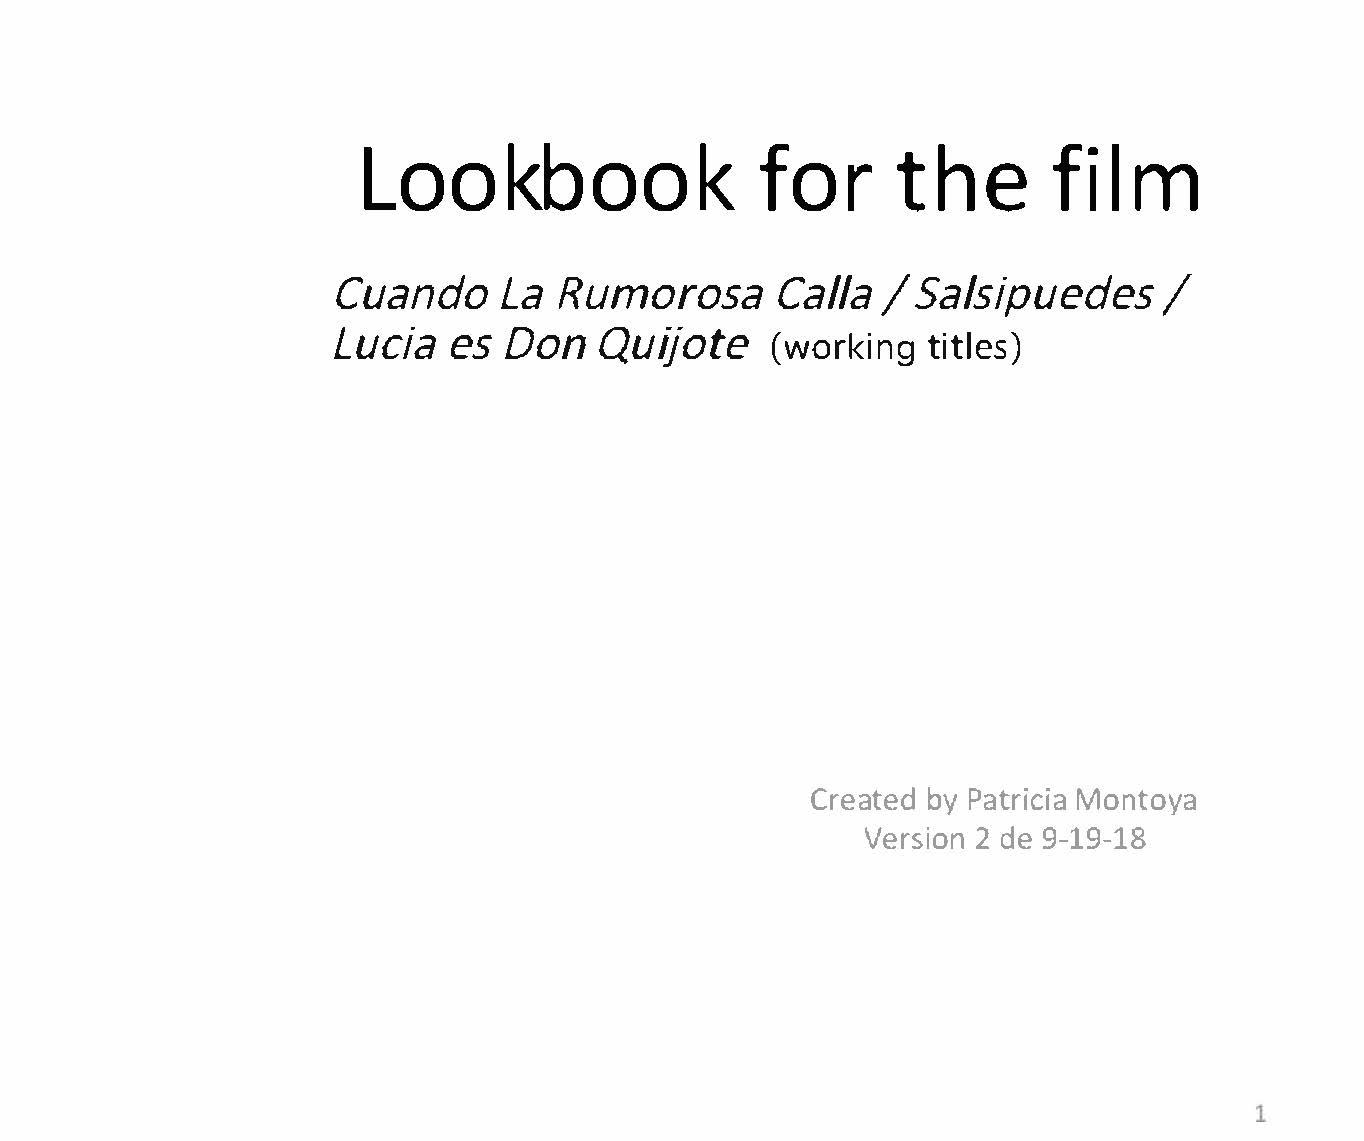 Copy of Lookbook